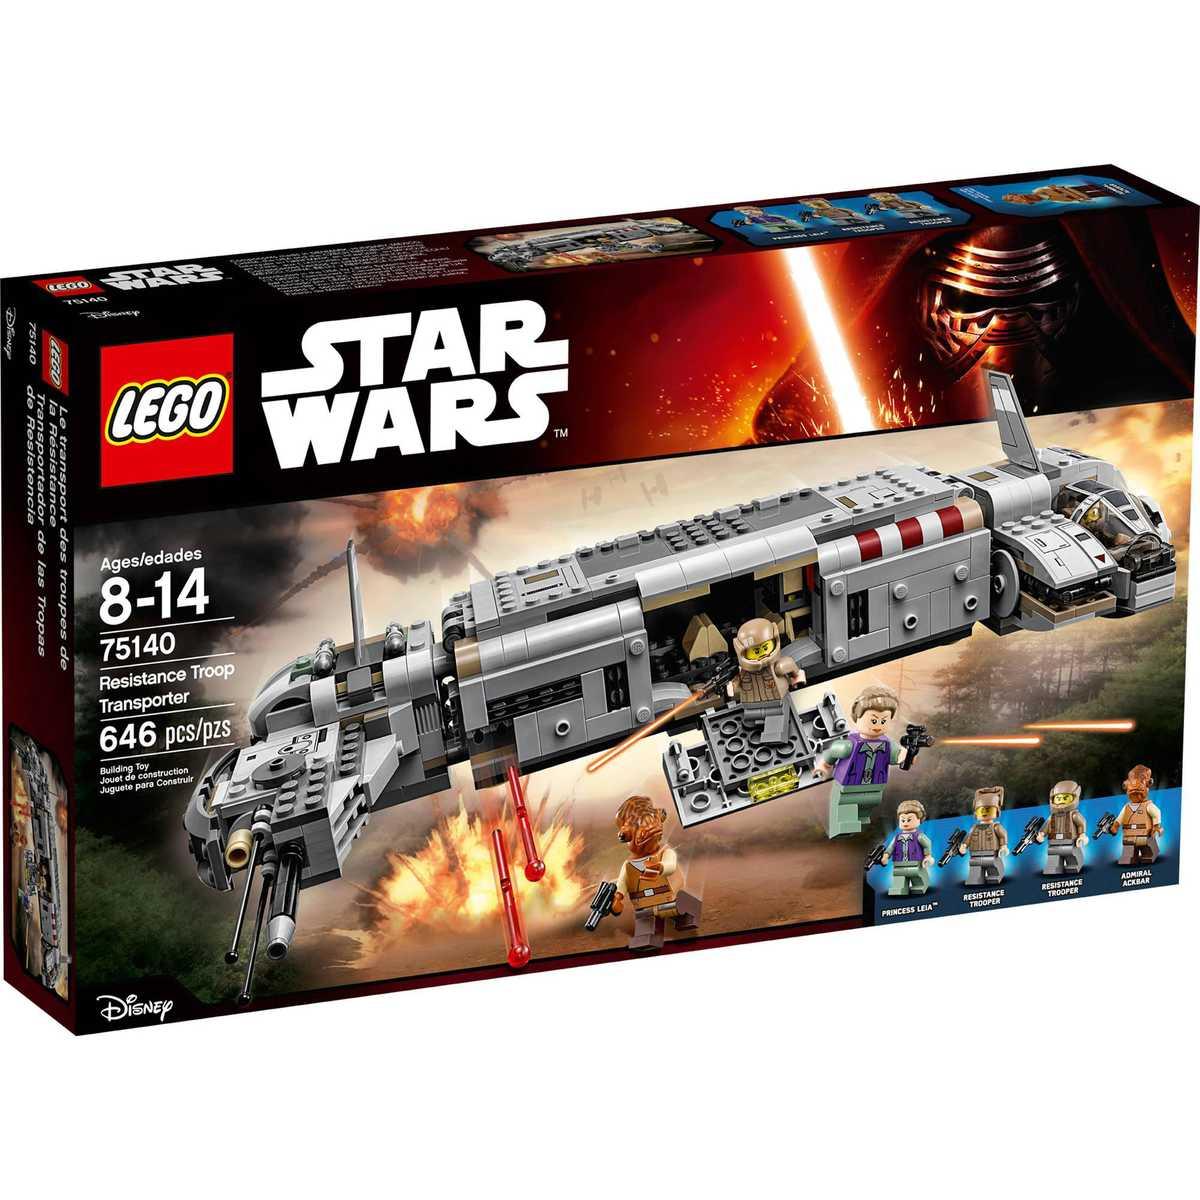 Konstruktorius LEGO Star Wars TM Resistance Troop Transporter 8-14 m. vaikams (75140)